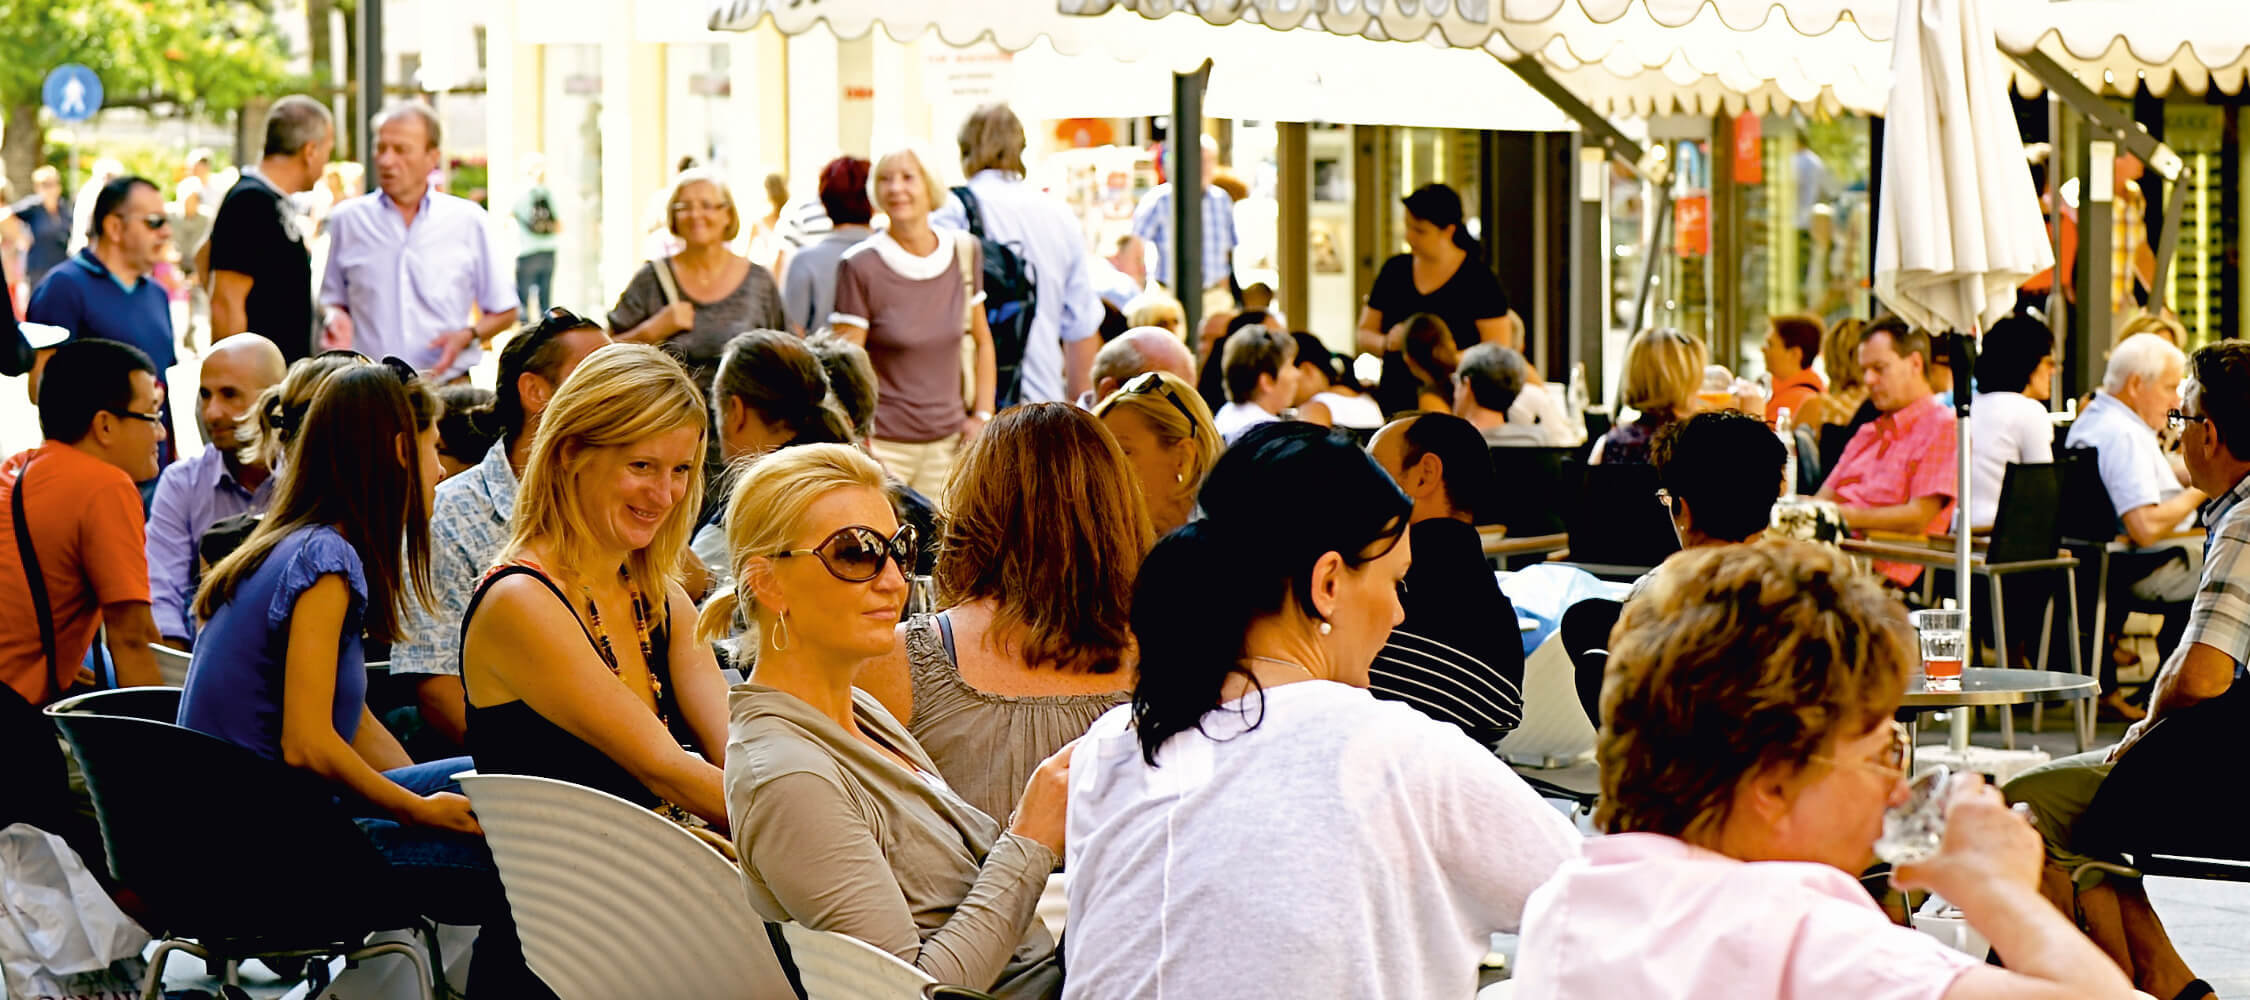 Italien-Trentino_Suedtirol_Alto_Adige_Merano_Meran_Lifestyle_Bar_Altstadt_Menschen_Sommer_Kaffee_Apertif_MGM-Andreas- Marini_mgm00663anma_2250x1000